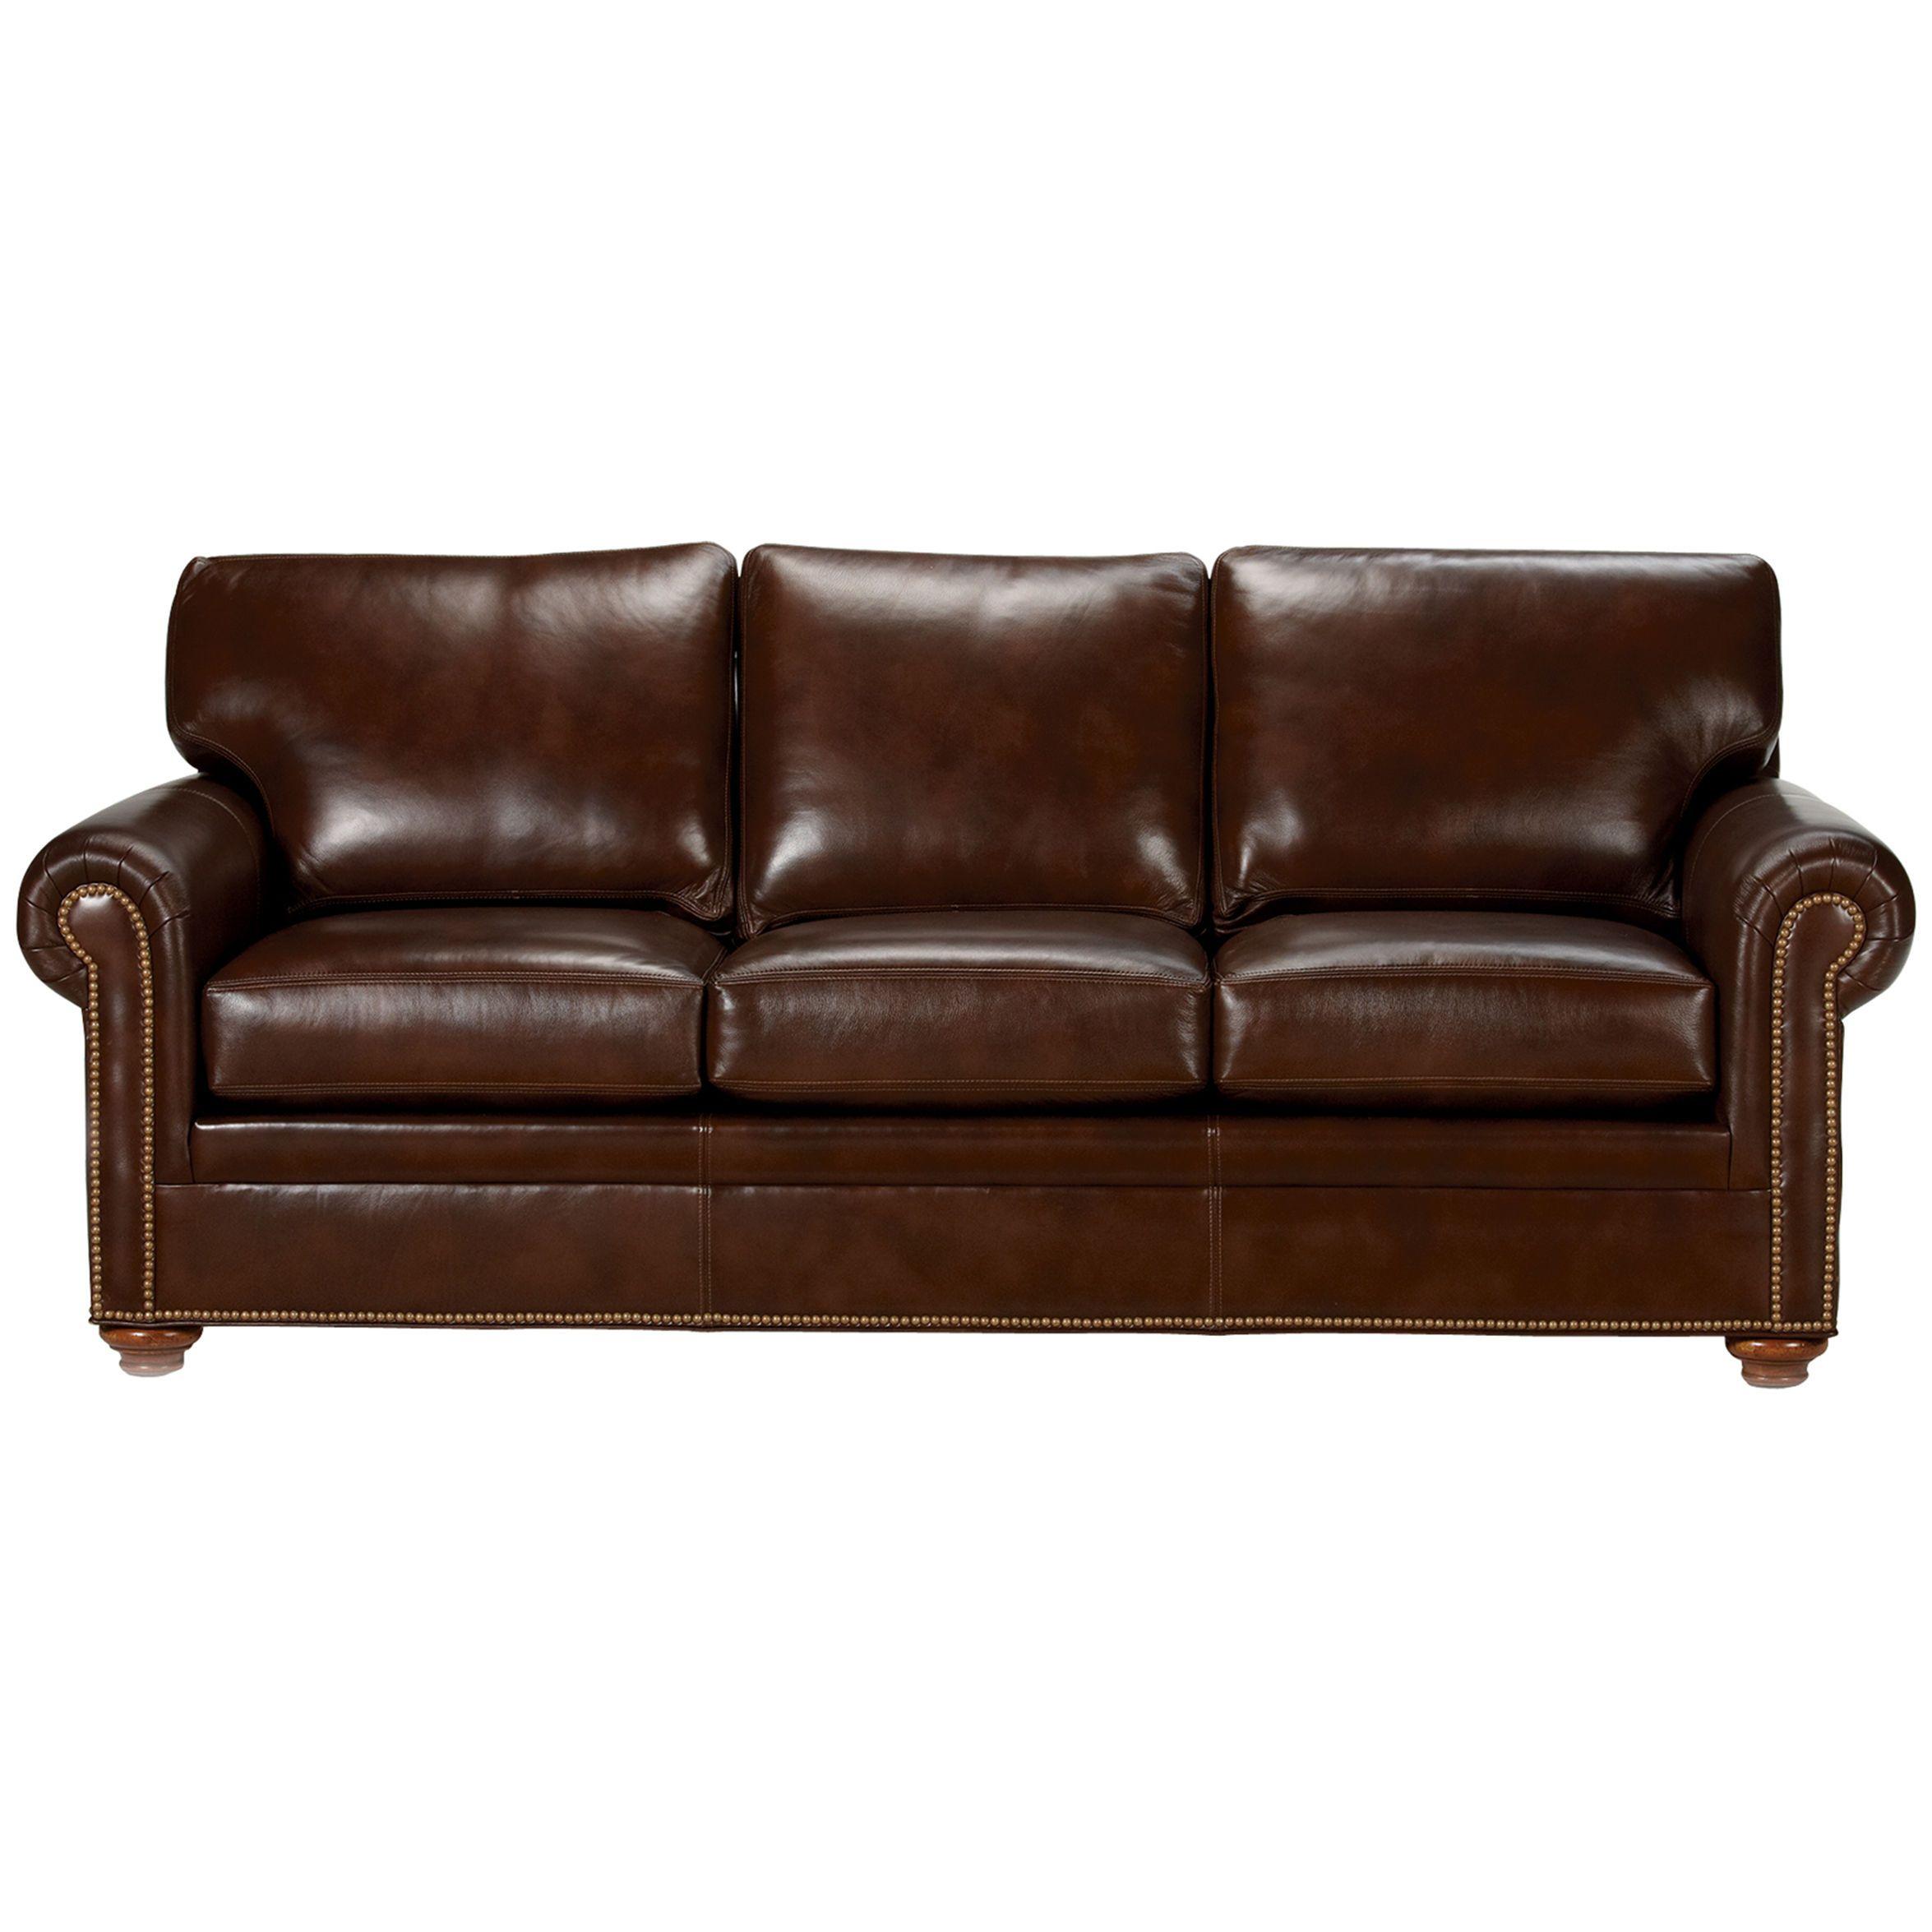 Conor Leather Sofa Omni Brown Leather Sofa Sofa Ethan Allen Sofa